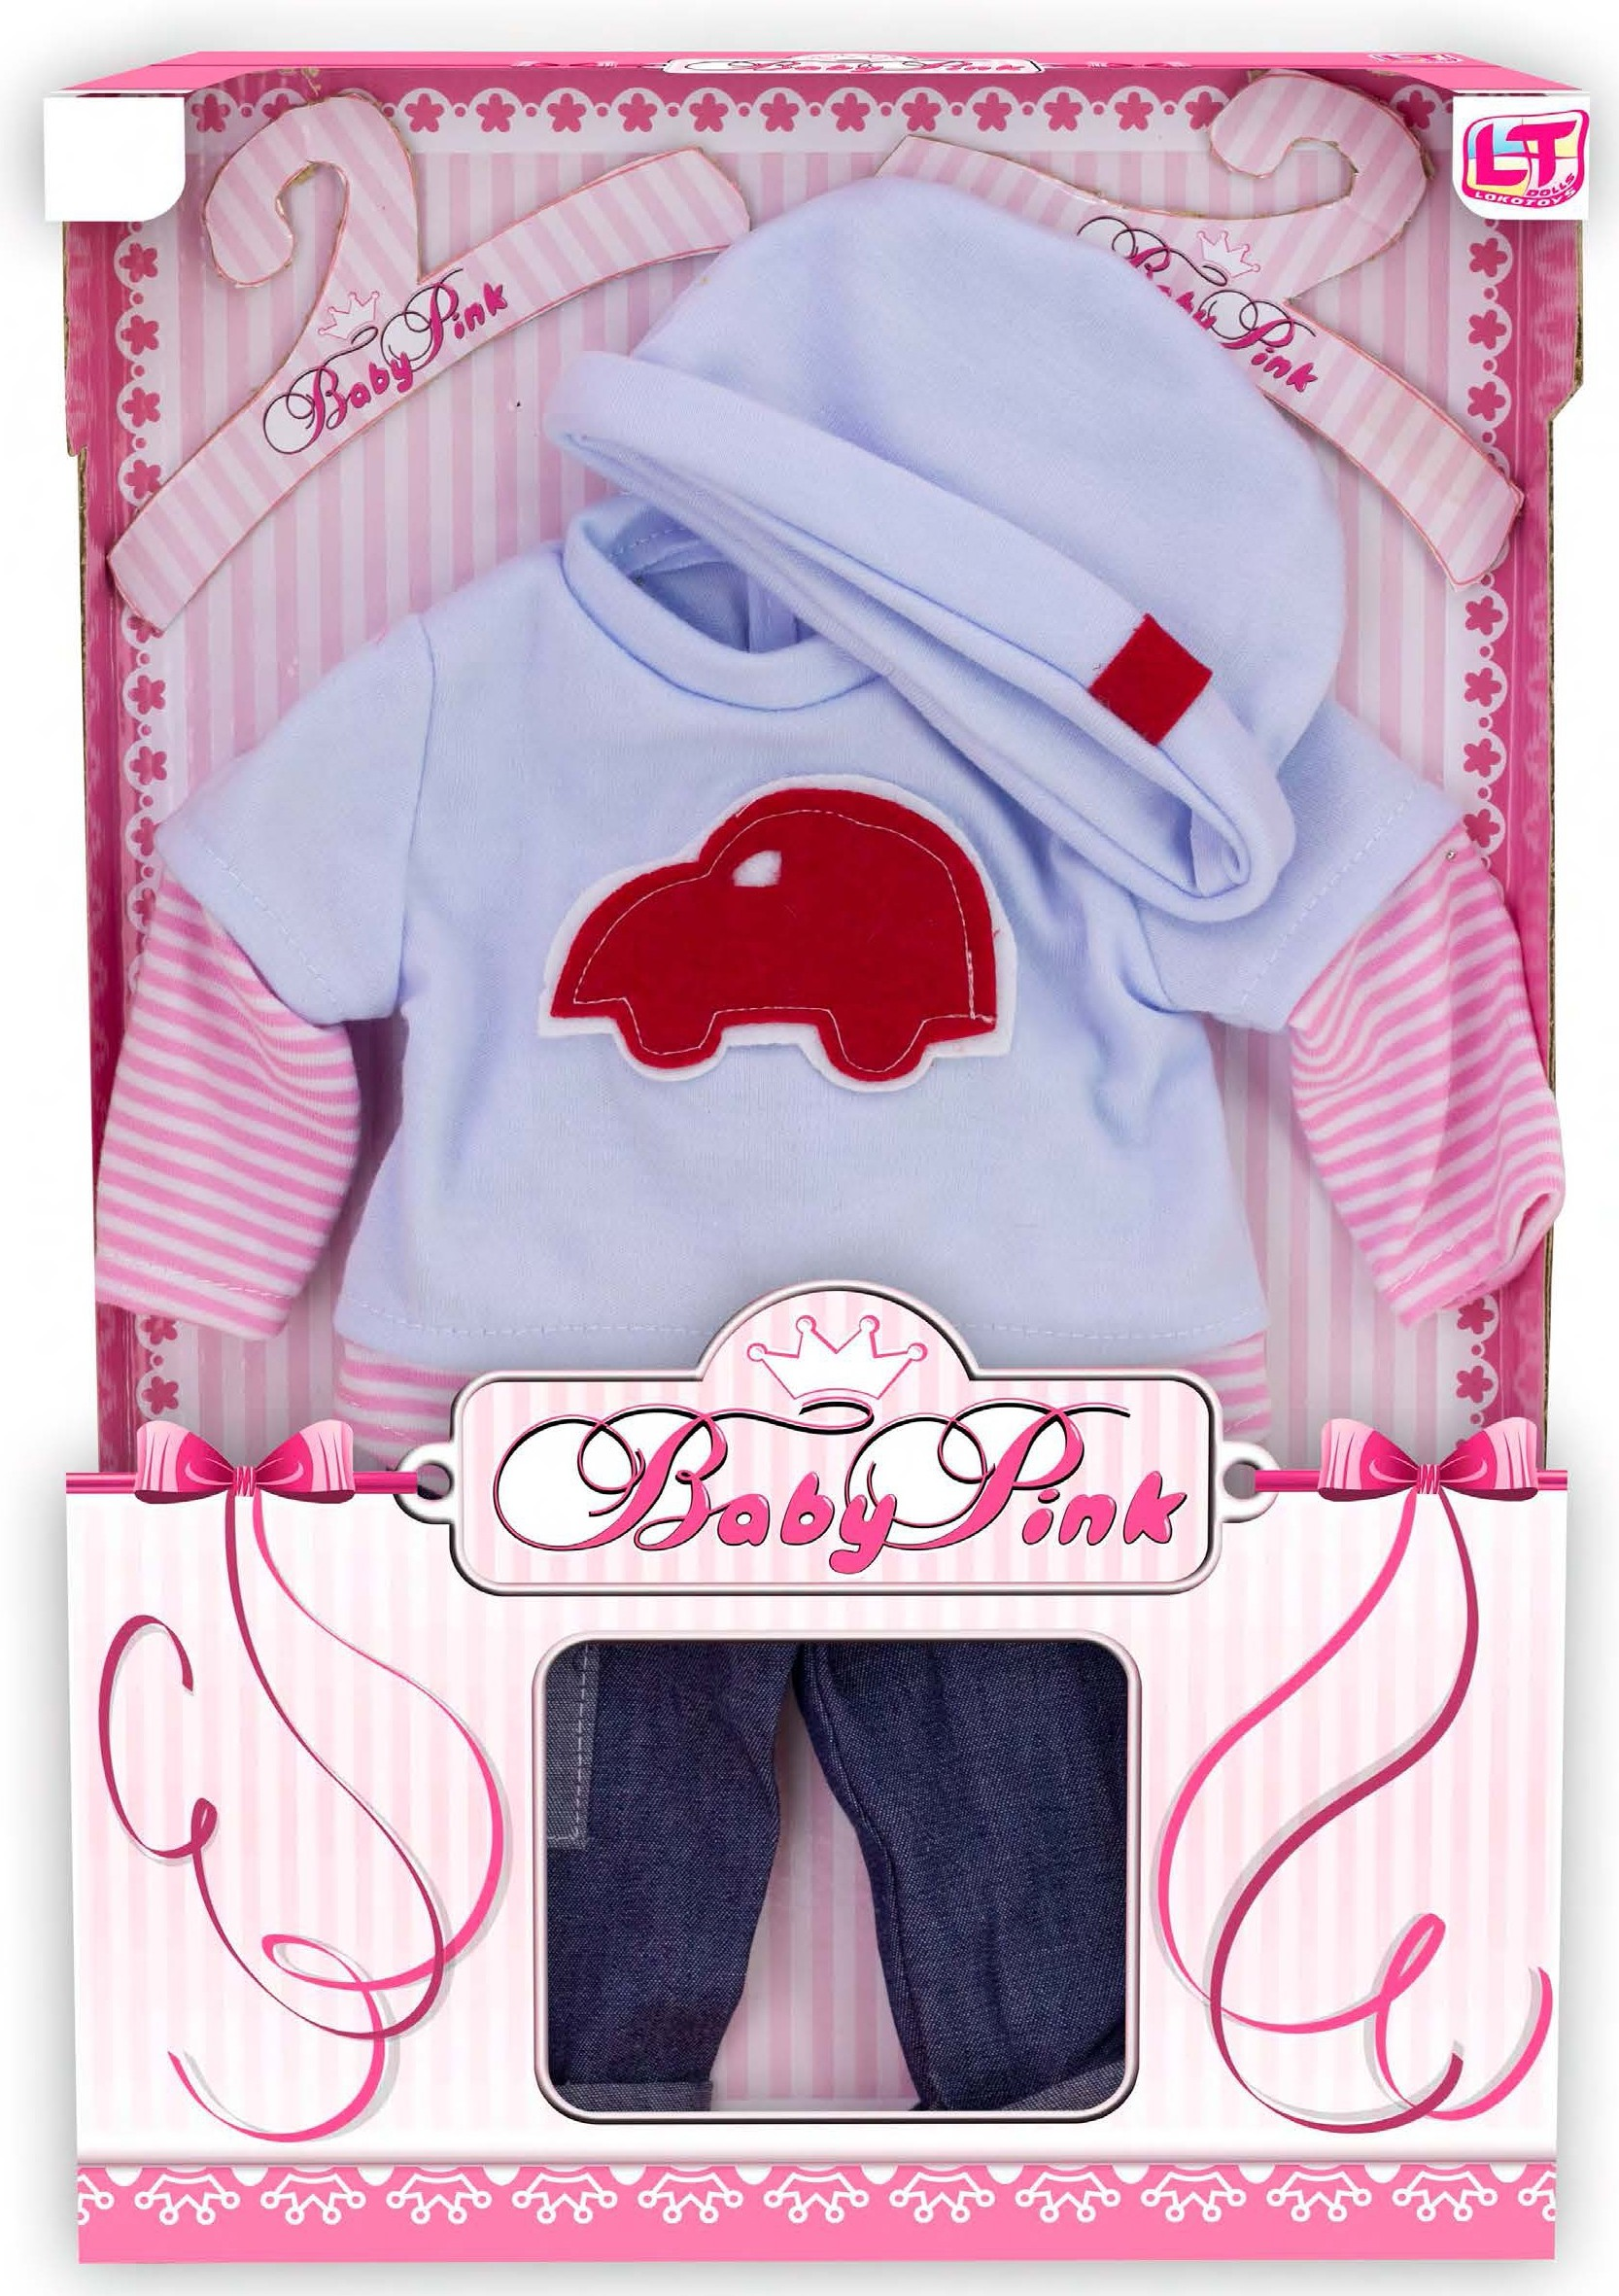 Одежда для кукол LokoToys Одежда для куклы мальчика Baby Pink - 98220 куклы и одежда для кукол famosa кукла нэнси волшебный поцелуй